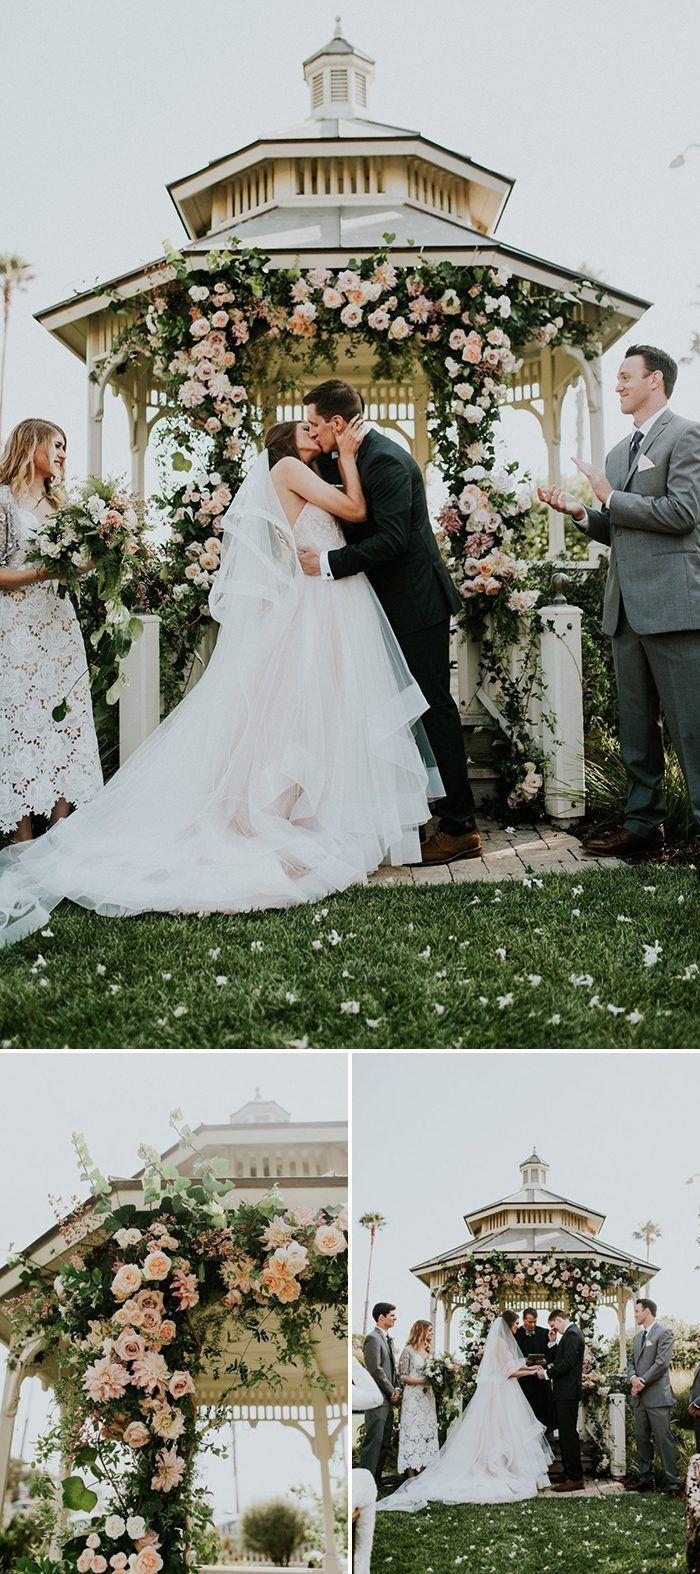 Floral Ceremony Arches for Every Wedding Style -   13 wedding Ceremony gazebo ideas